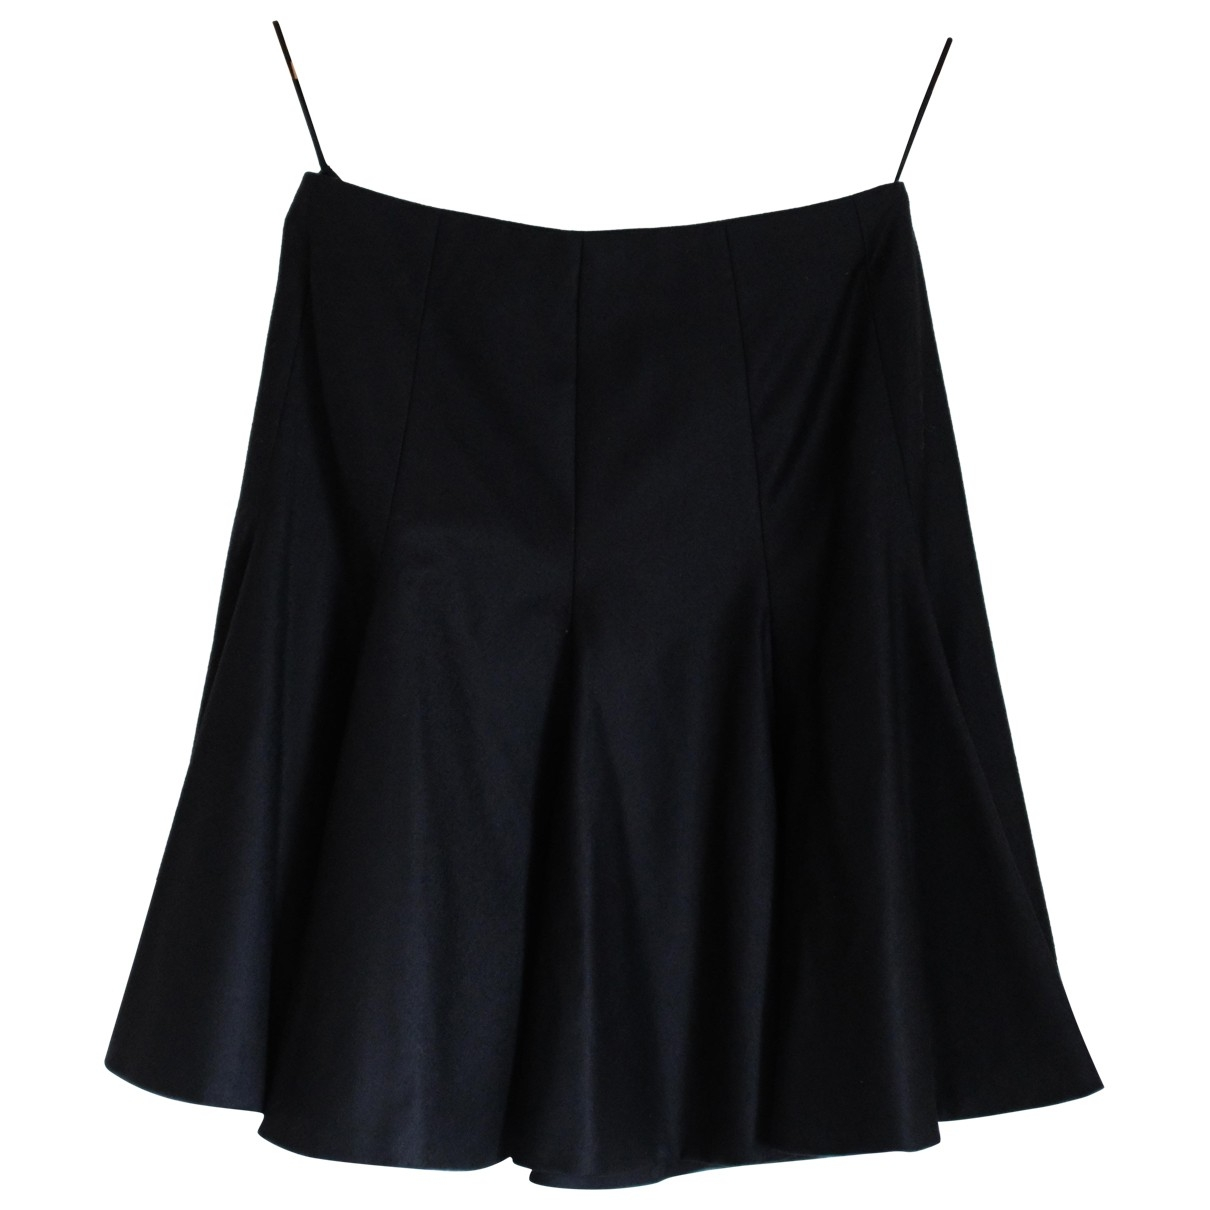 Stella Mccartney \N Black Wool skirt for Women M International